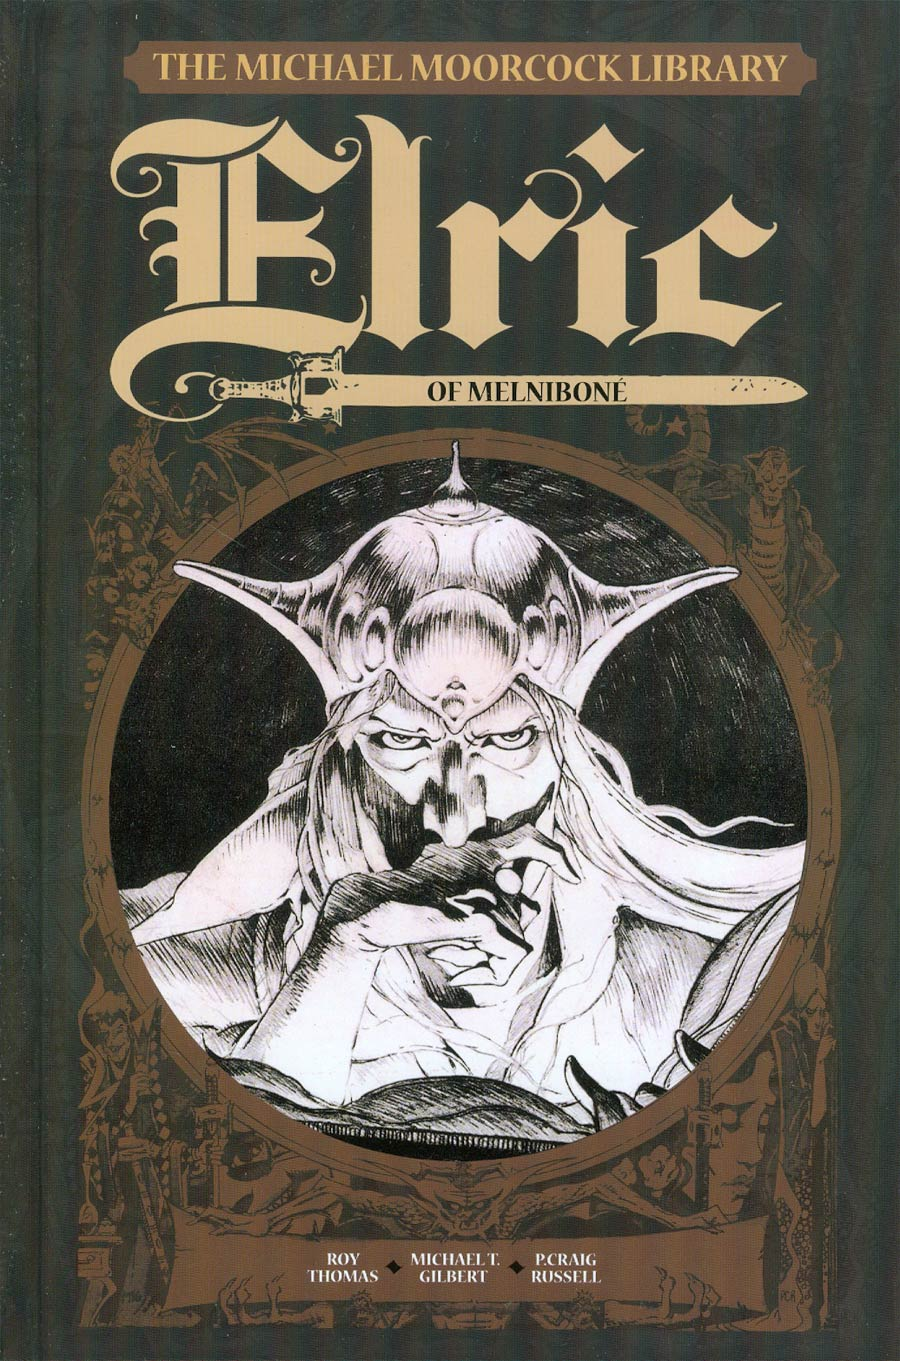 Michael Moorcock Library Vol 1 Elric Of Melnibone HC